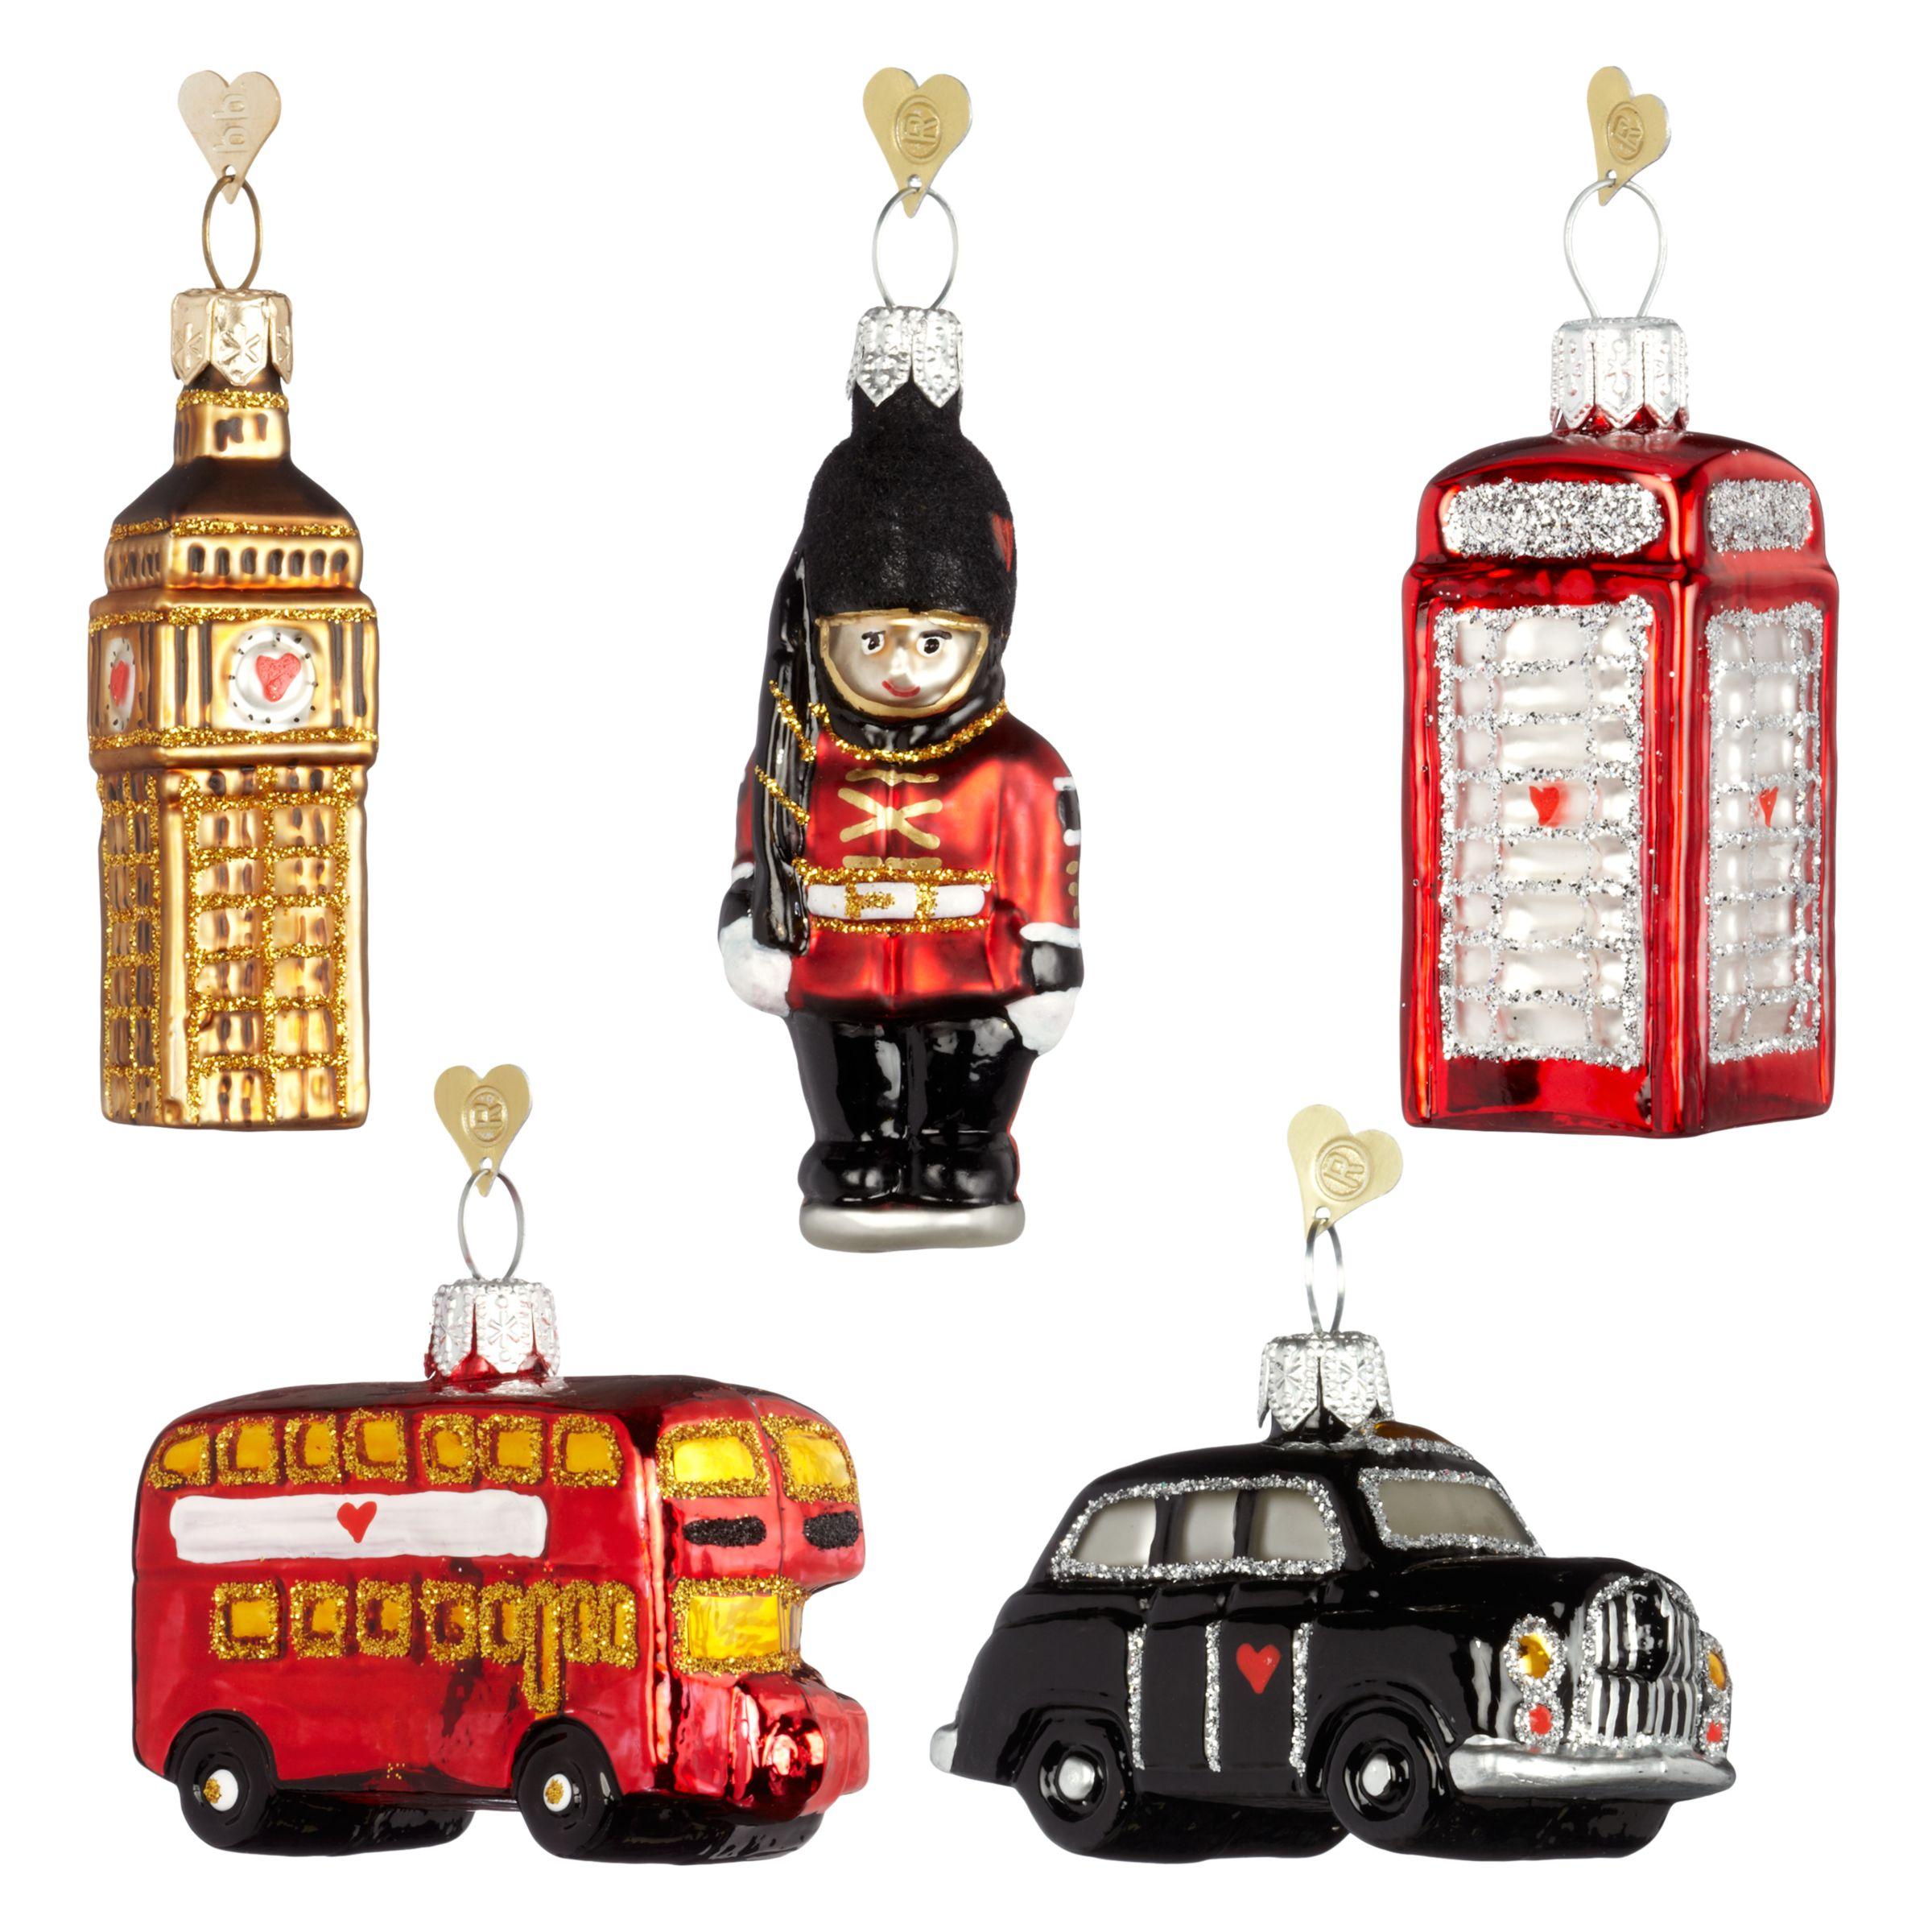 Bombki Bombki Tourism Little London Glass Hanging Decorations, Set of 5